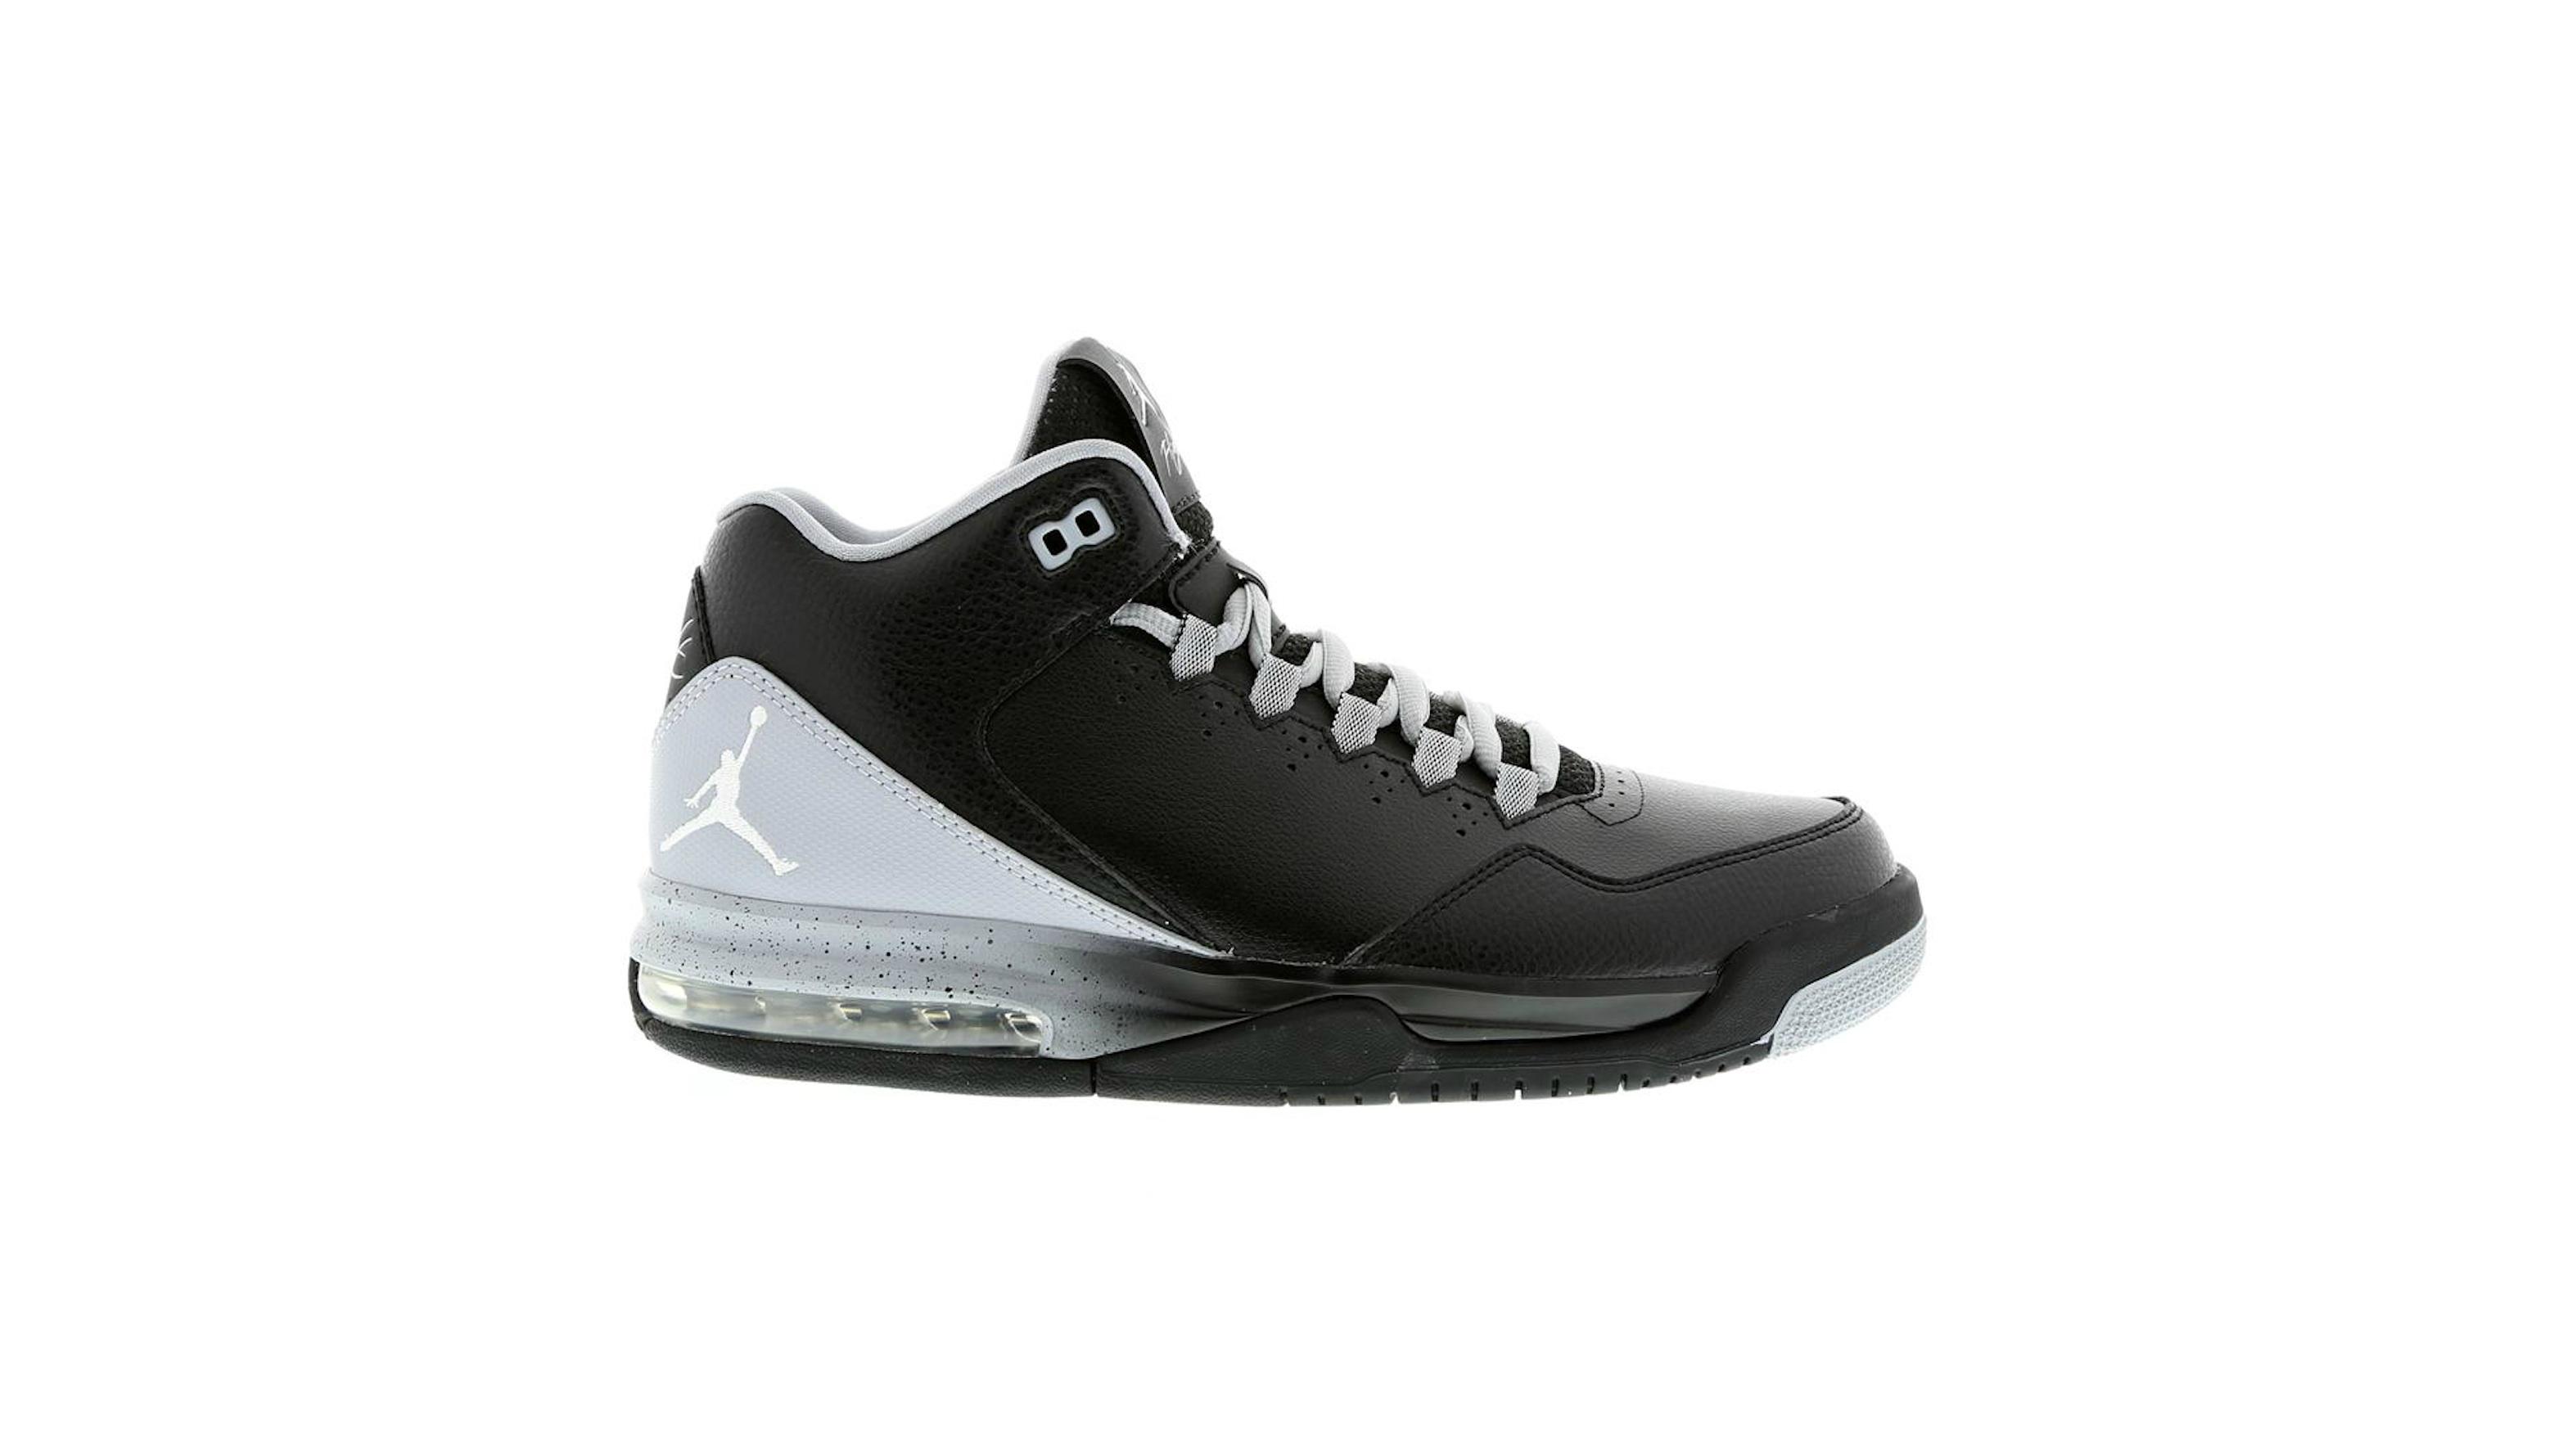 19a83b7c506ac Acquista scarpe jordan prezzo foot locker